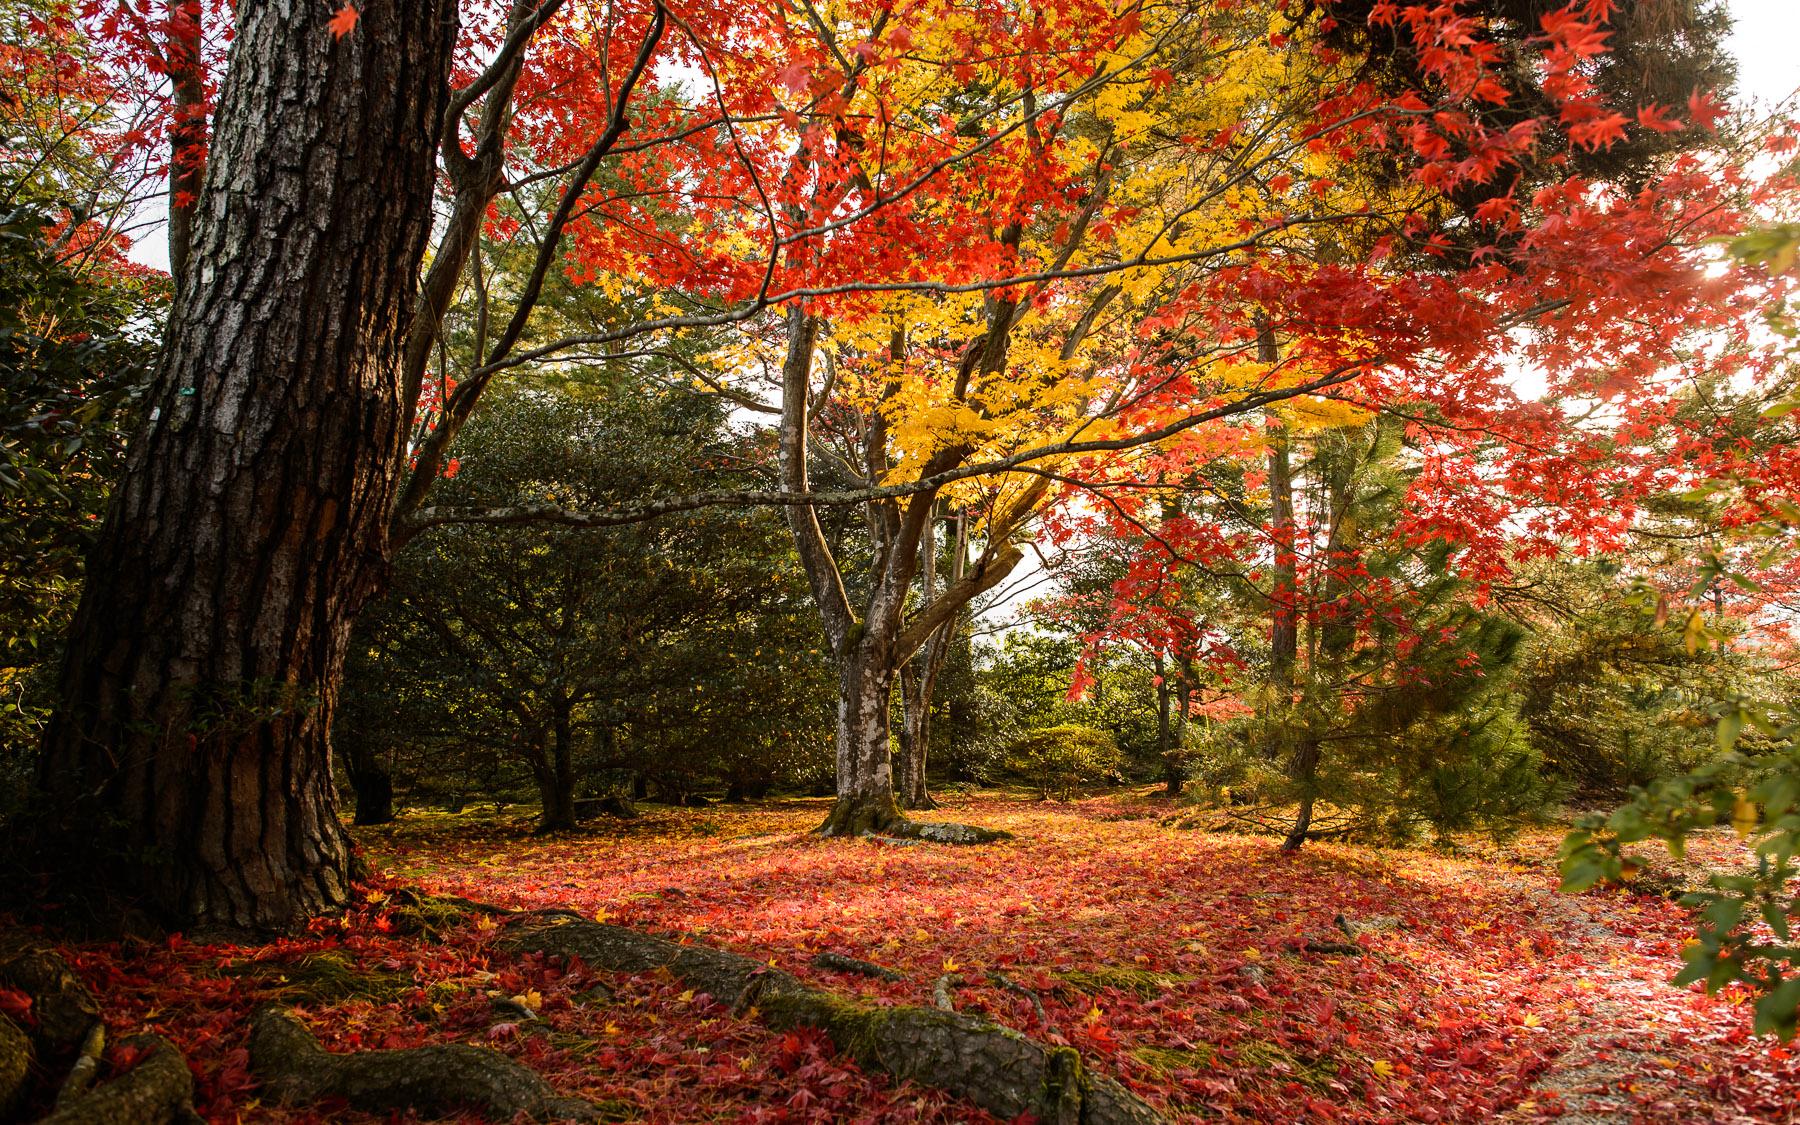 Fall Colors Desktop Wallpaper Wwwwallpapers In Hdcom Fall Scenes 2880 1800x1125 Download Hd Wallpaper Wallpapertip